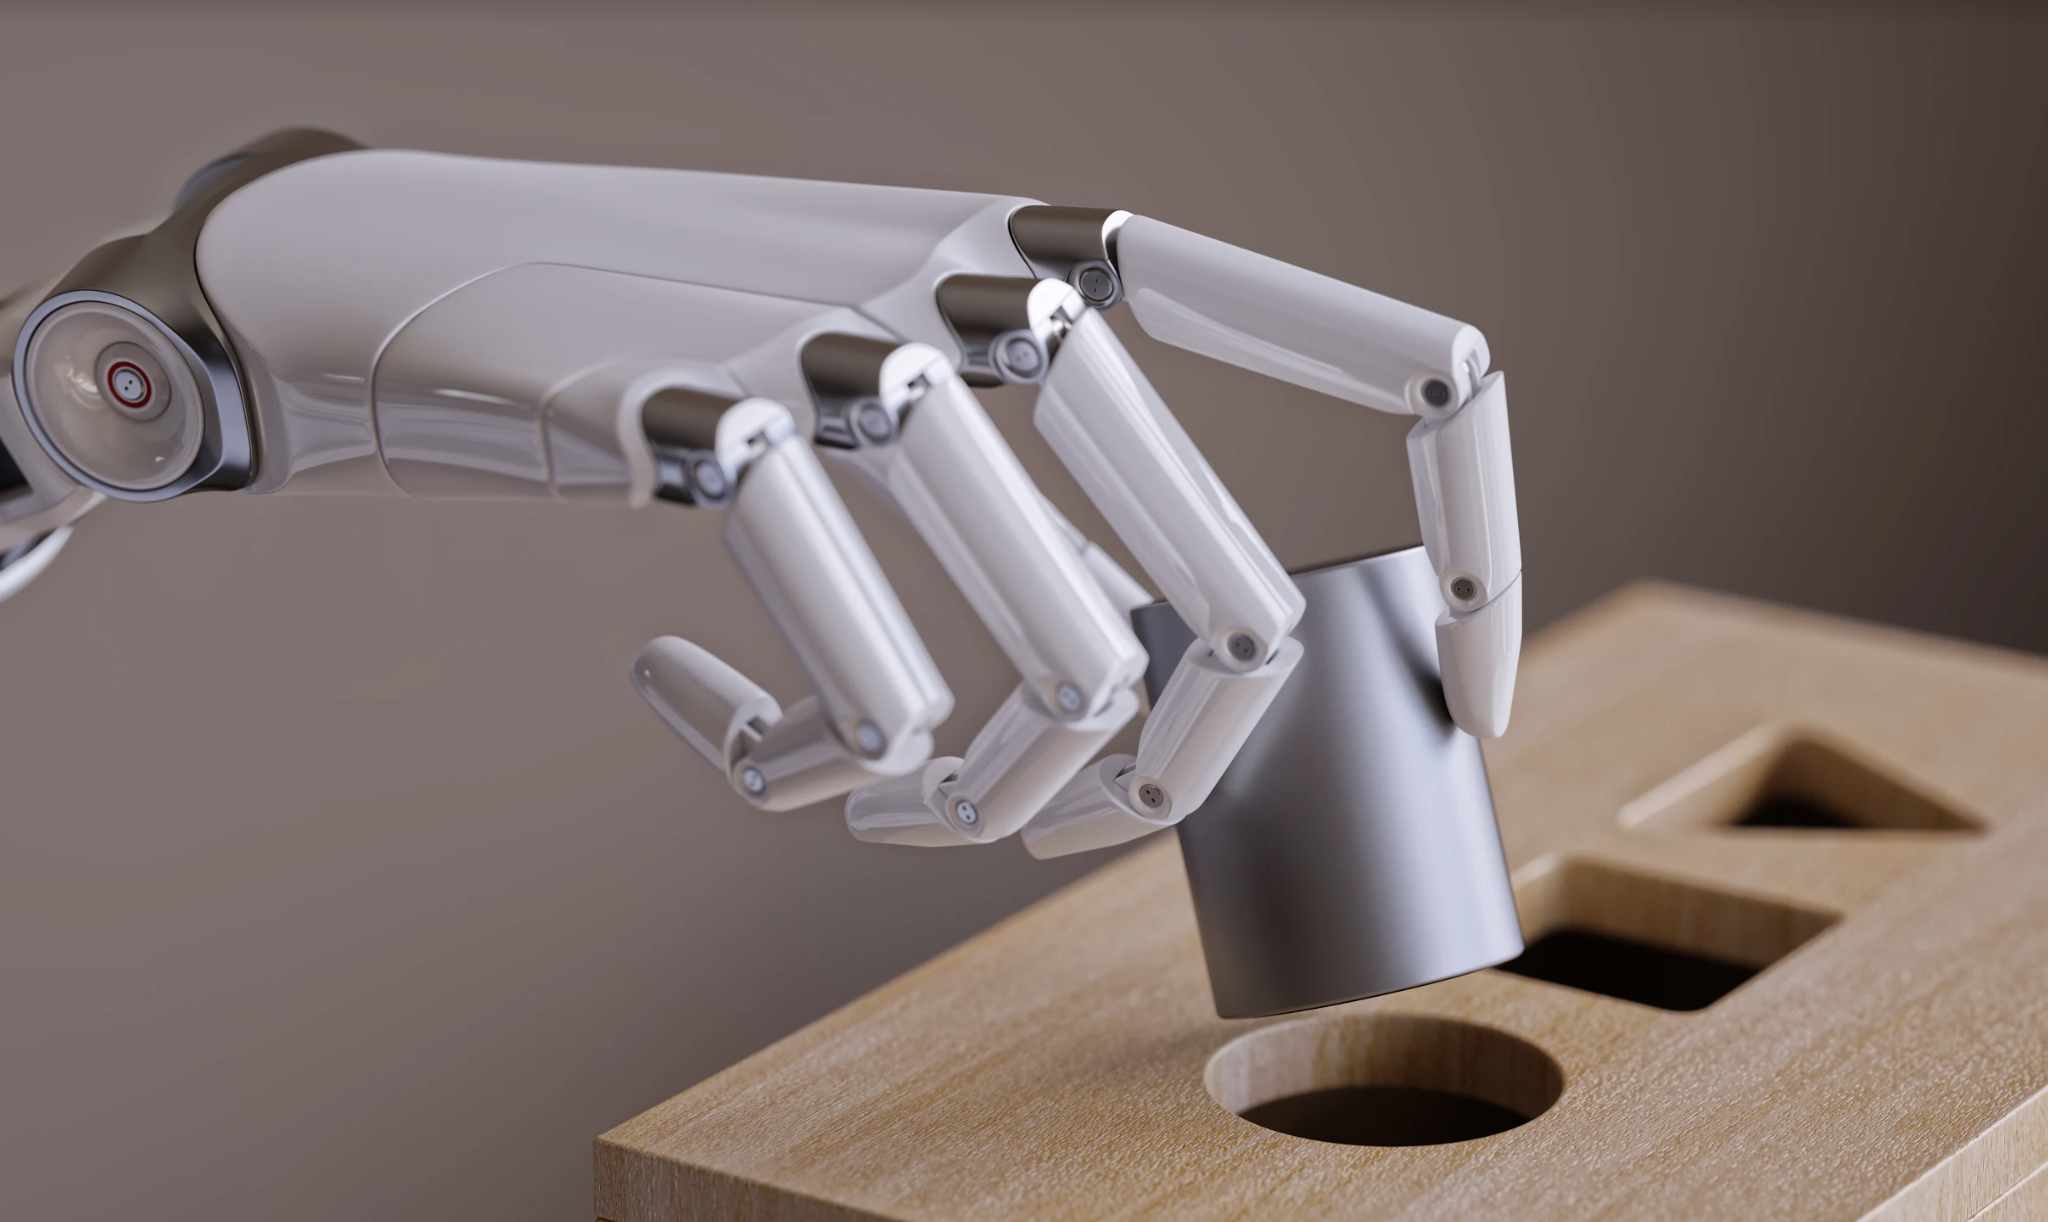 Machine Learning - Fundamental Principles